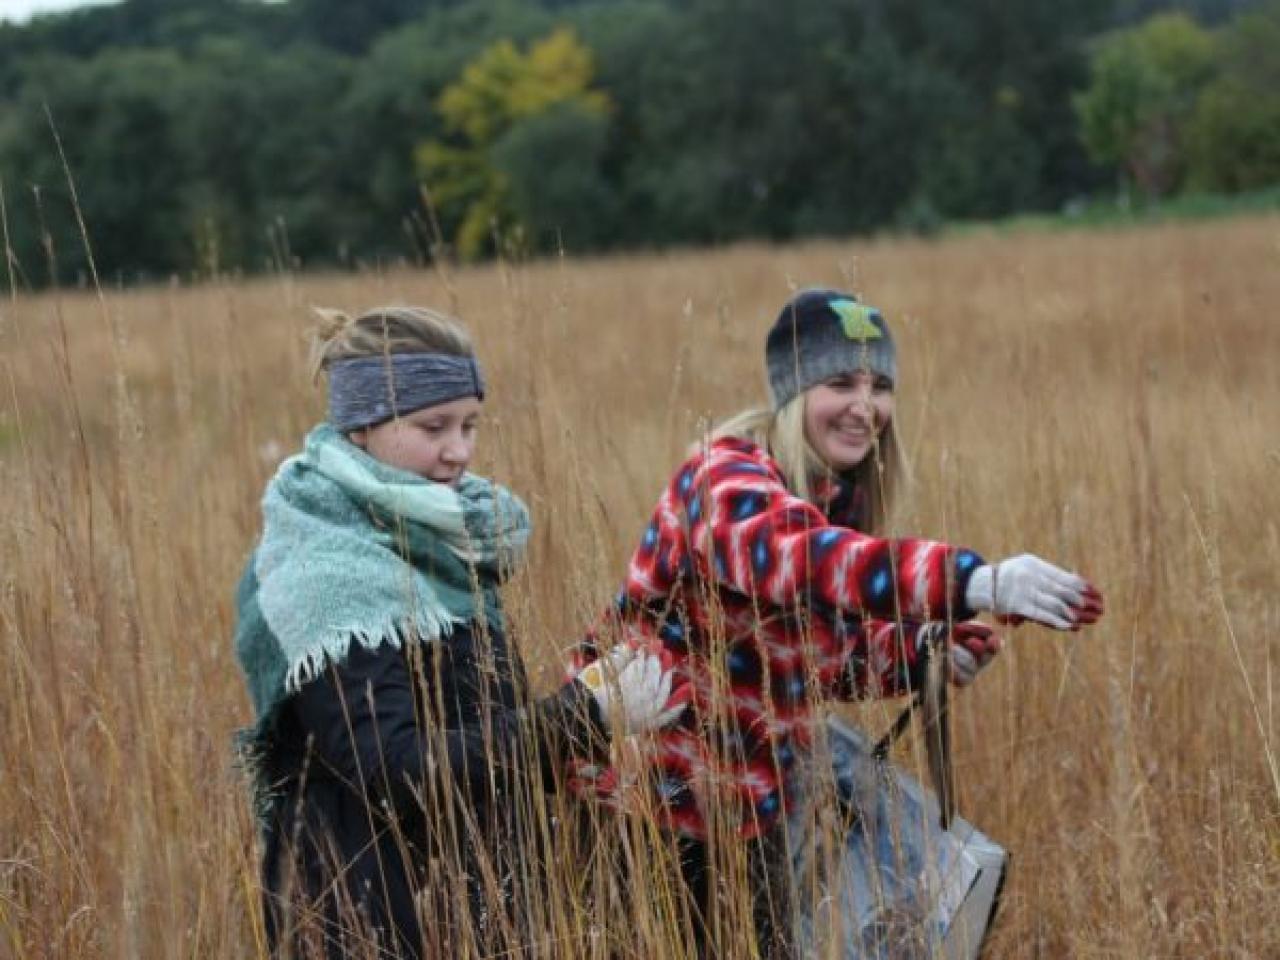 Habitat restoration volunteers collecting native seed in the prairie.